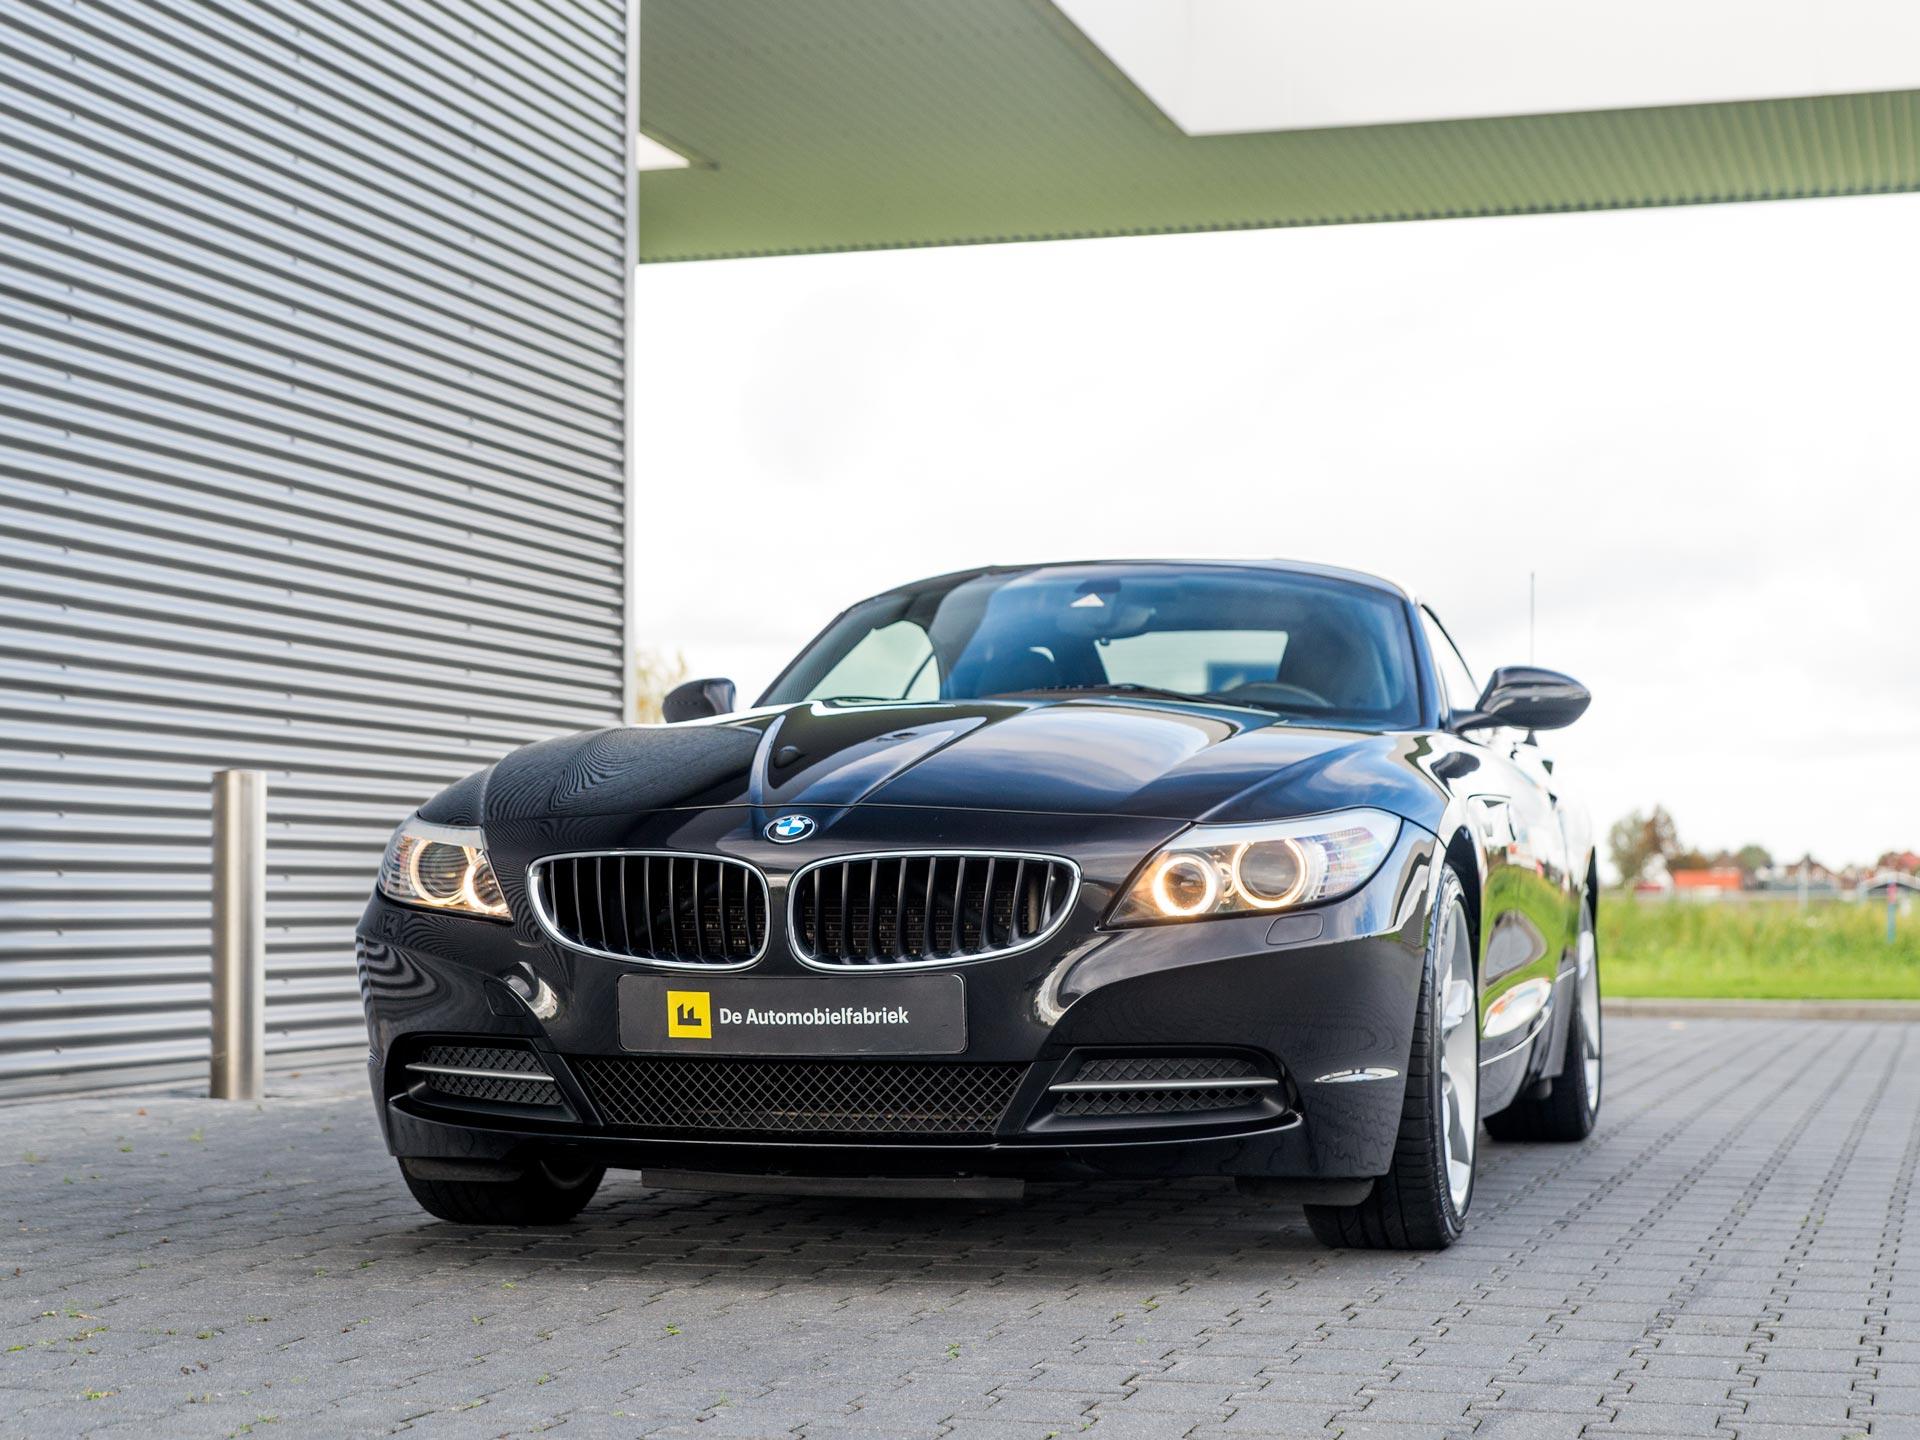 Tweedehands BMW Z4 Roadster occasion